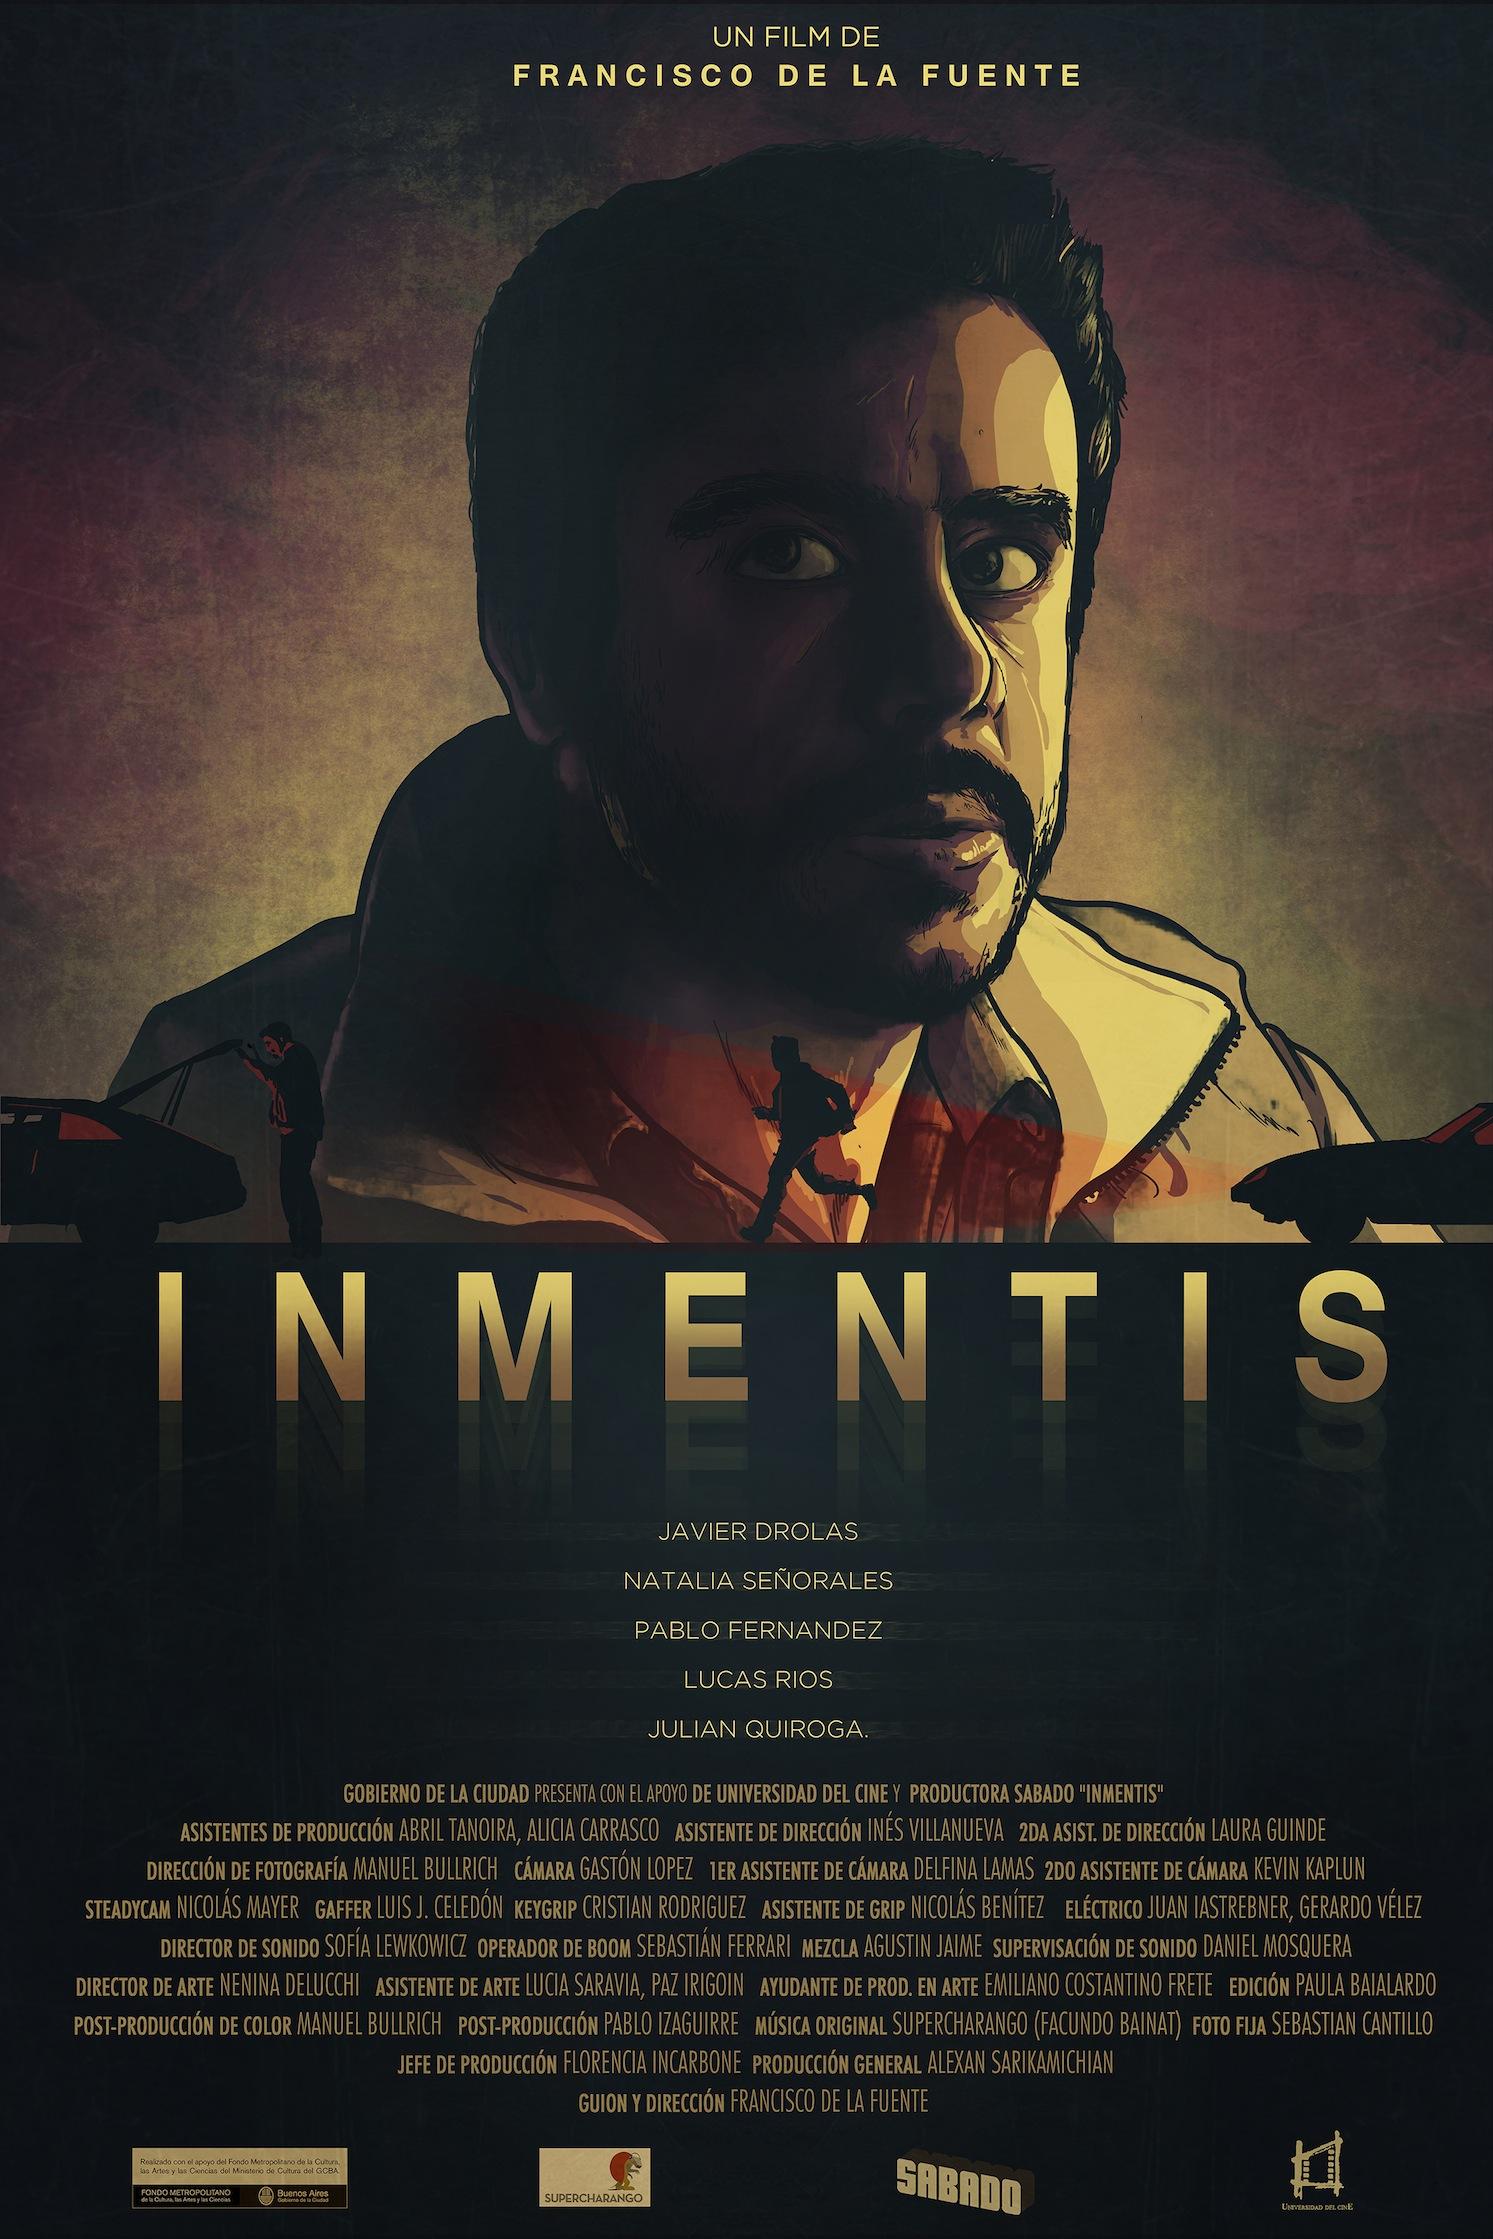 INMENTIS_poster